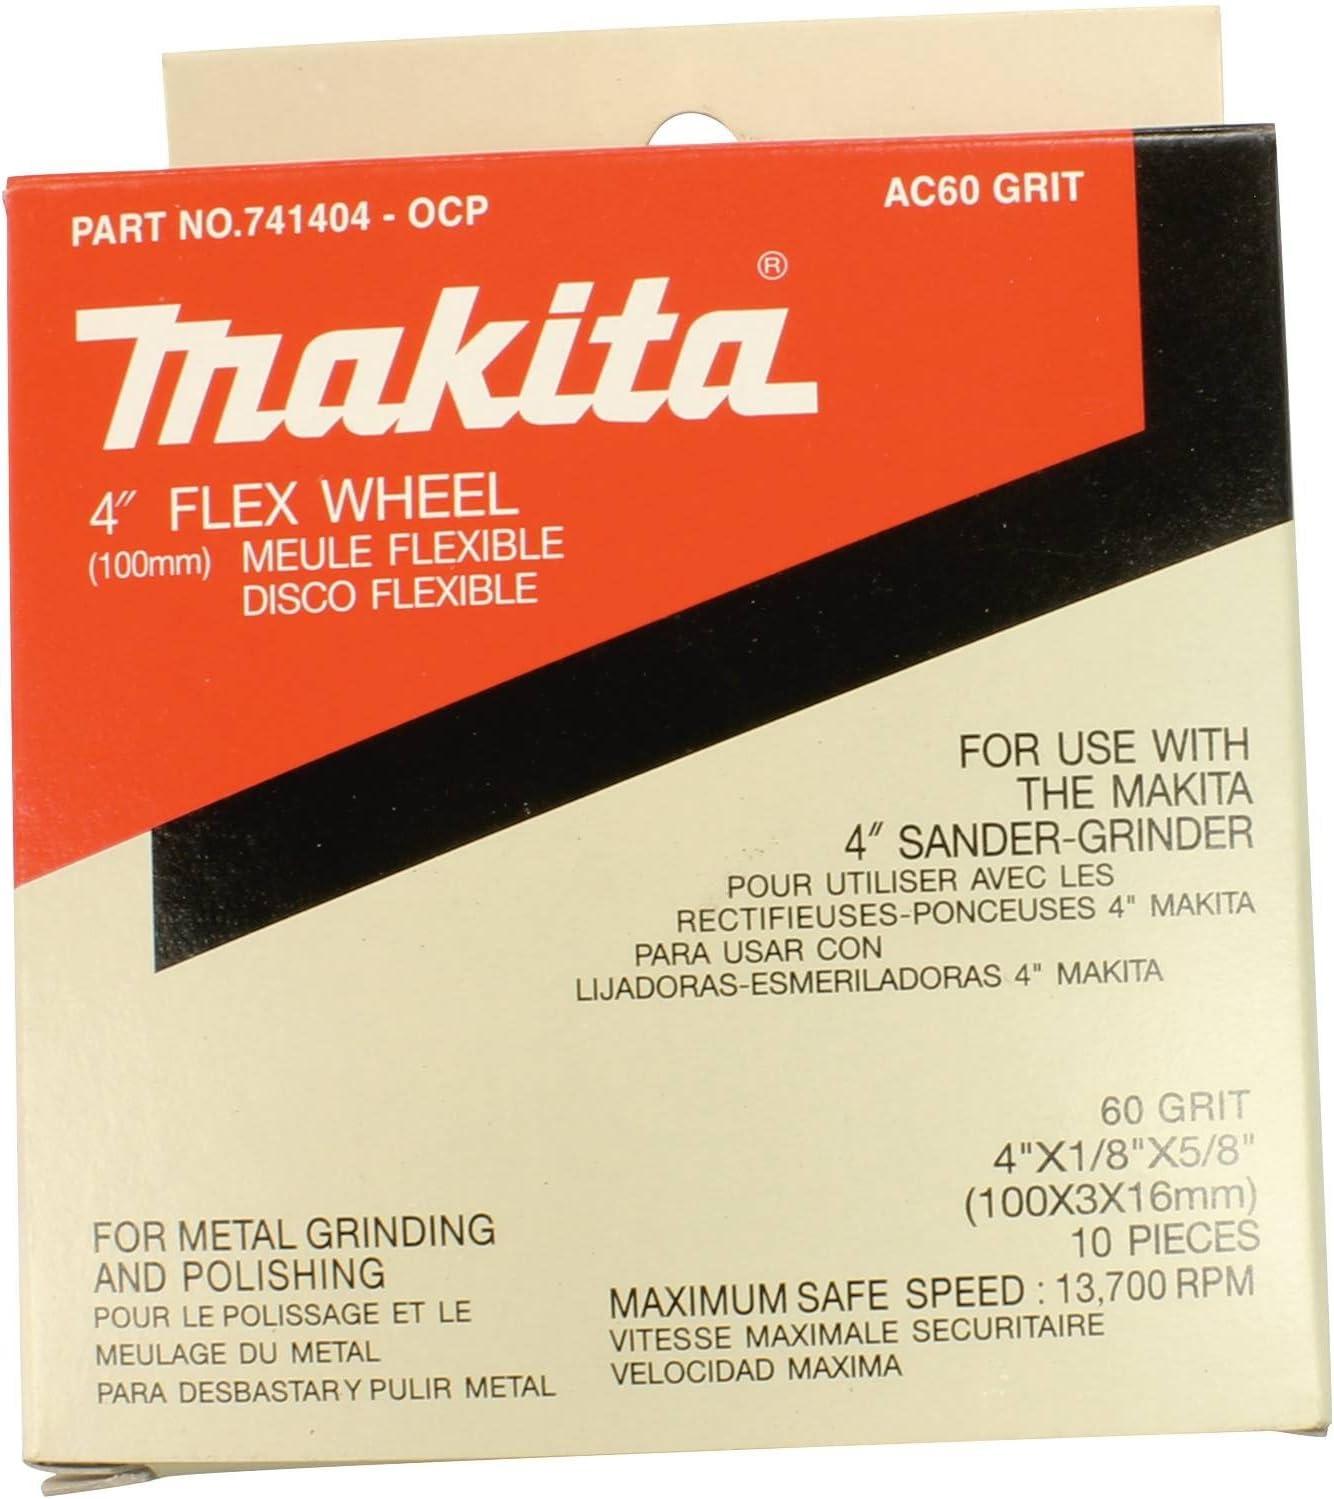 10-Pack Makita 741404-0CP 4-Inch Flex Wheel #60